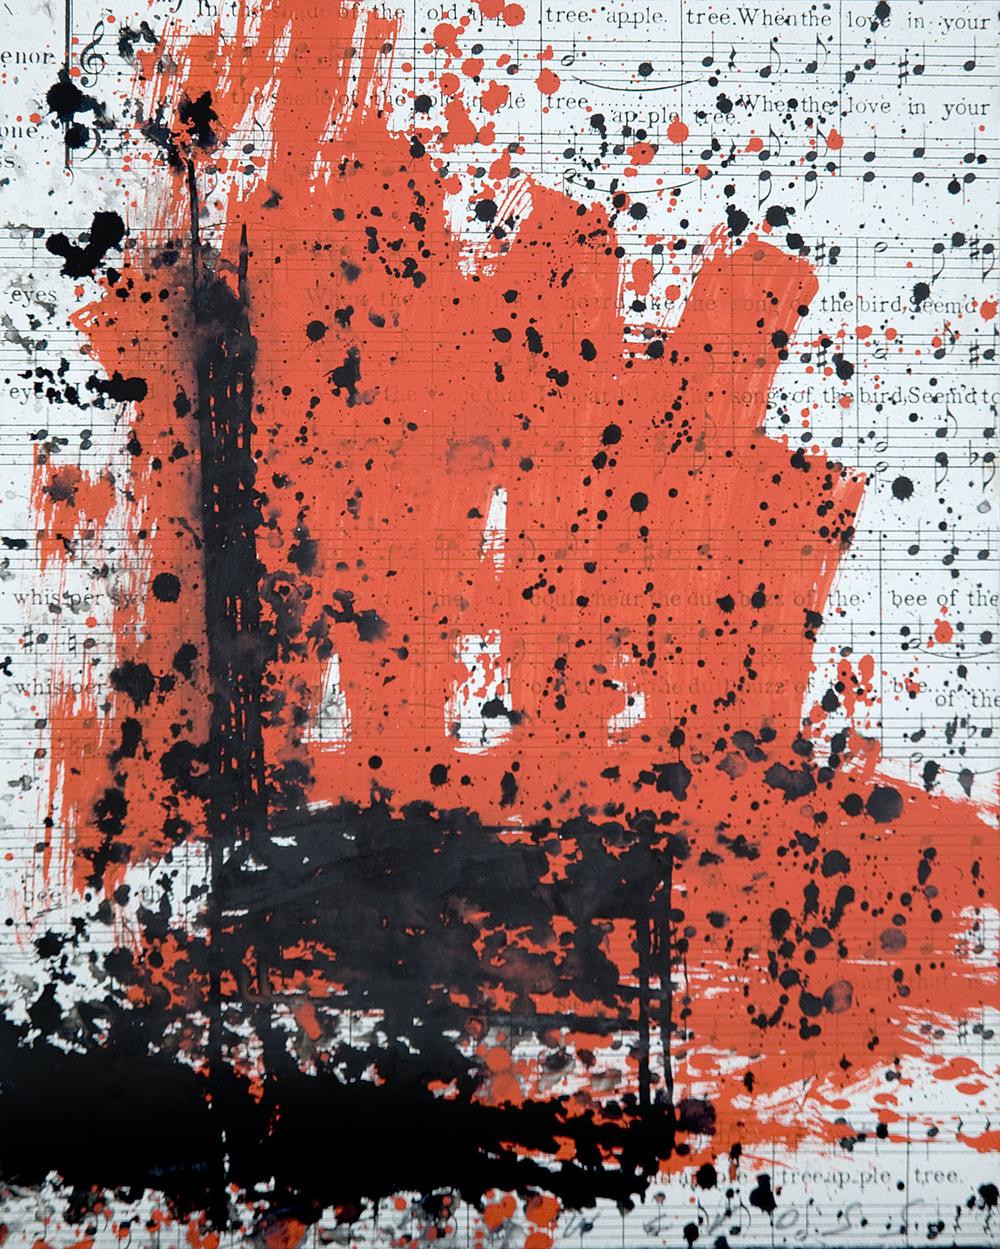 Neil Shawcross_-_#24_acrylic on paper_86.5 x 81.5cm.jpg